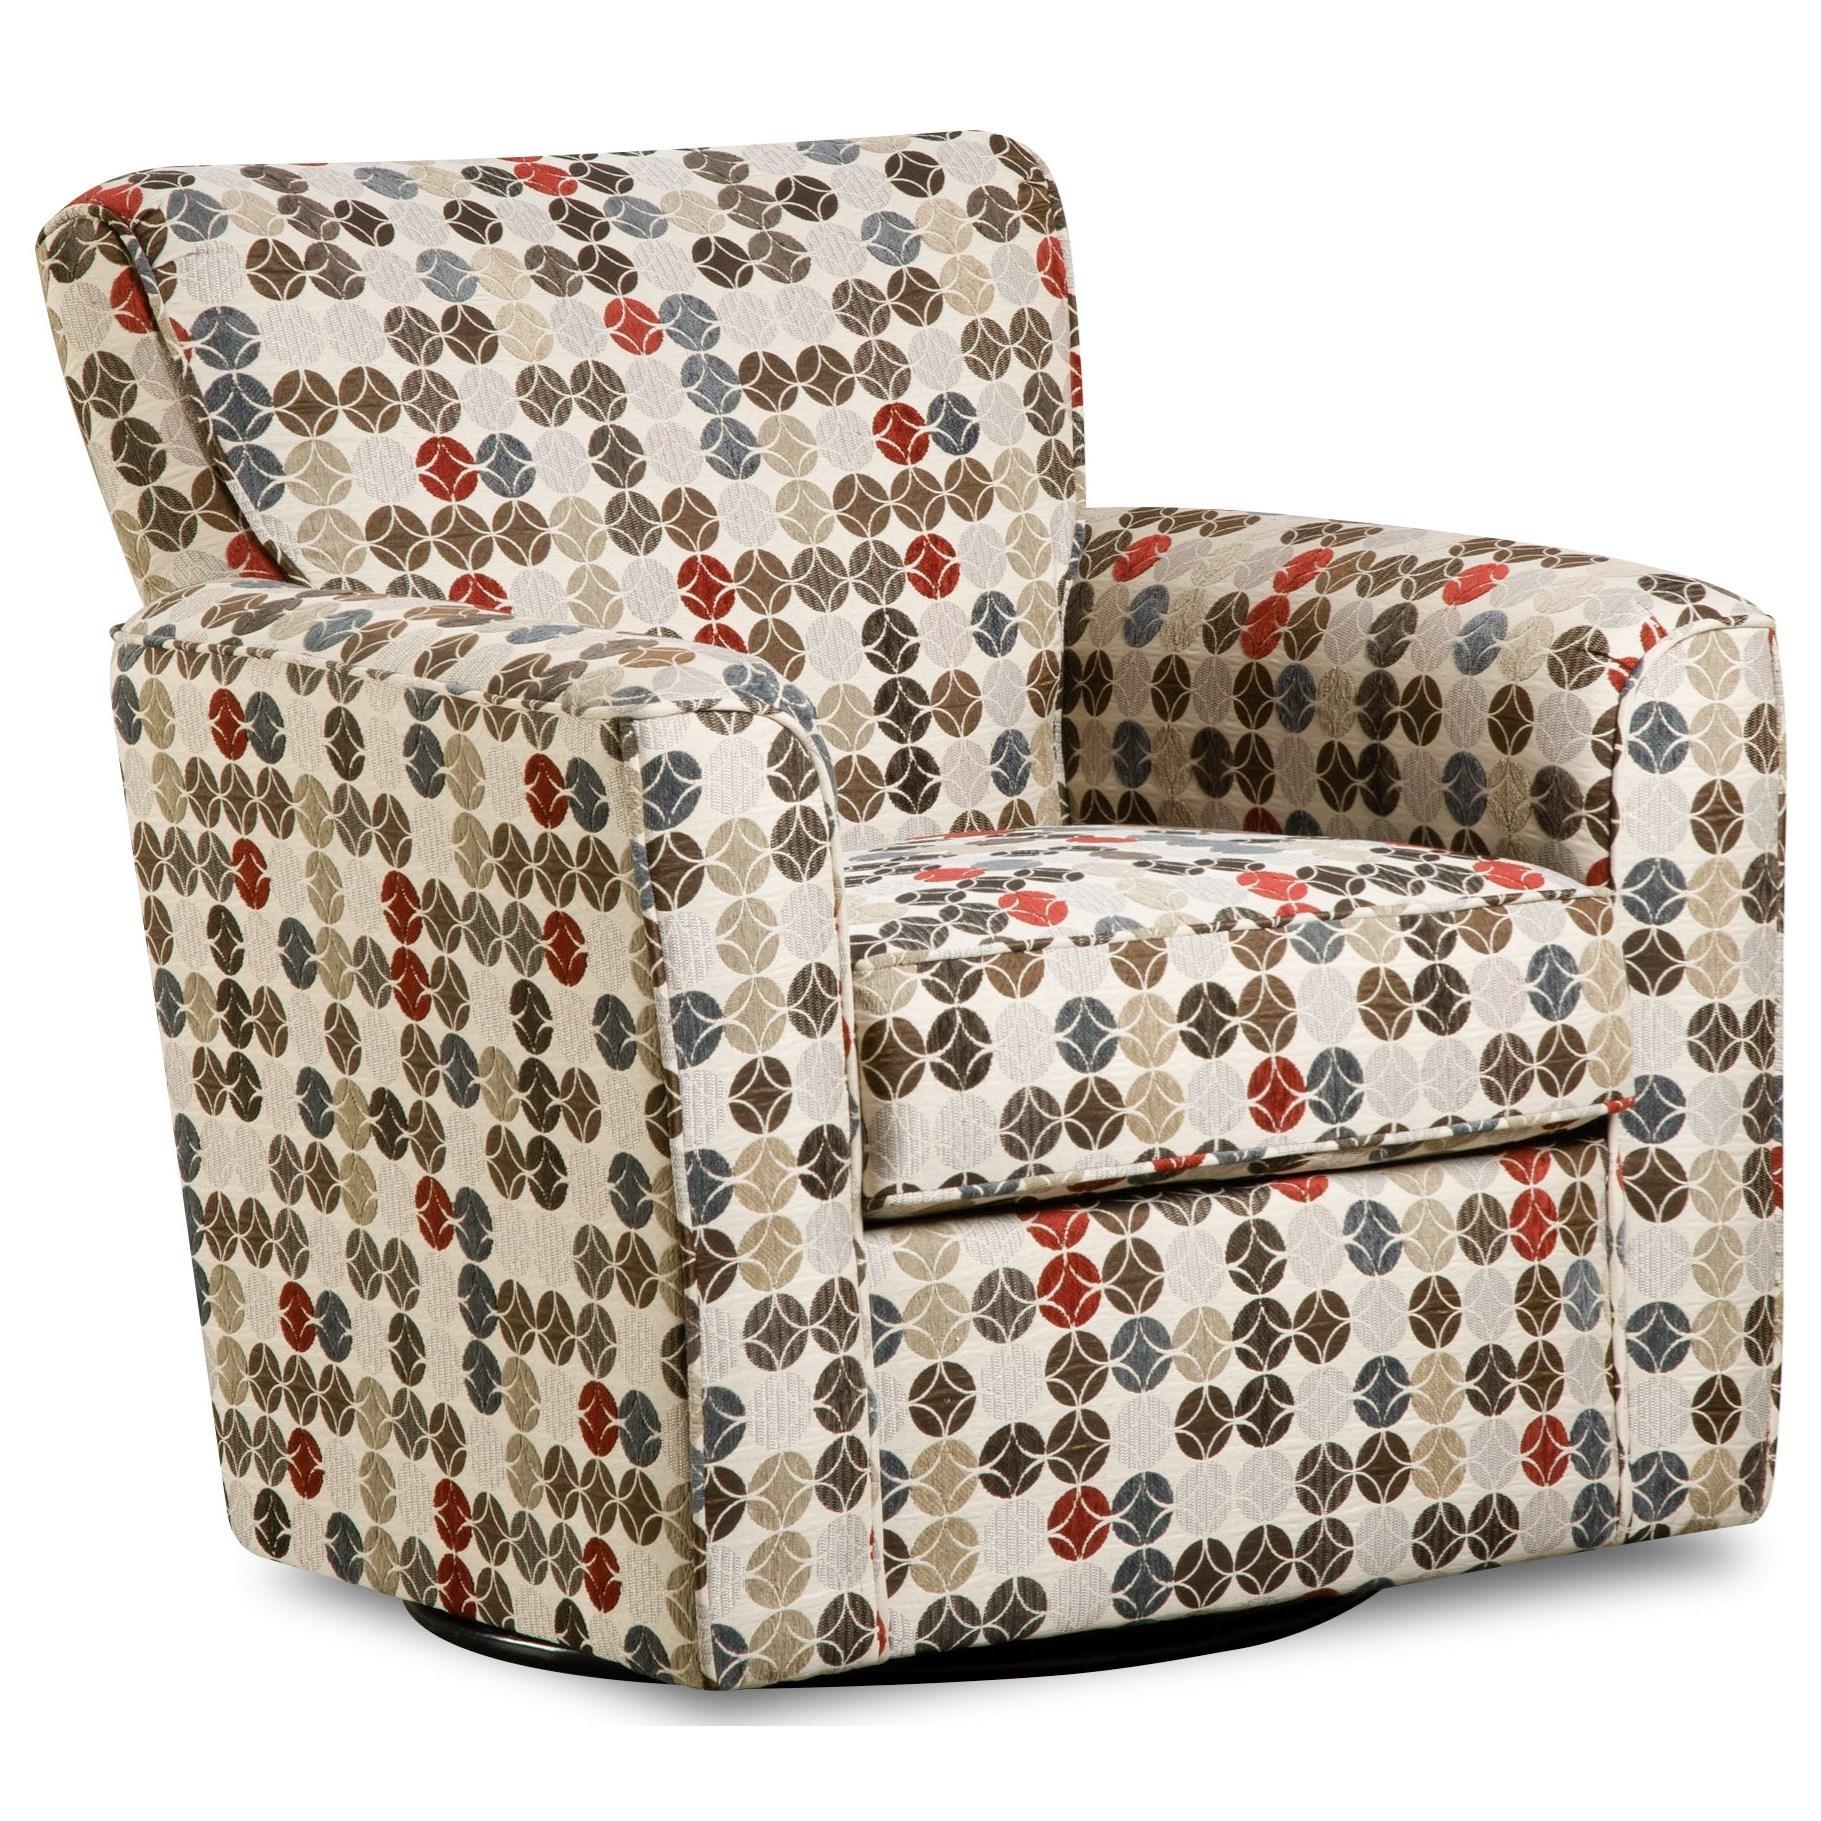 160 Casual Swivel Glider Chair by United Furniture Industries at Bullard Furniture